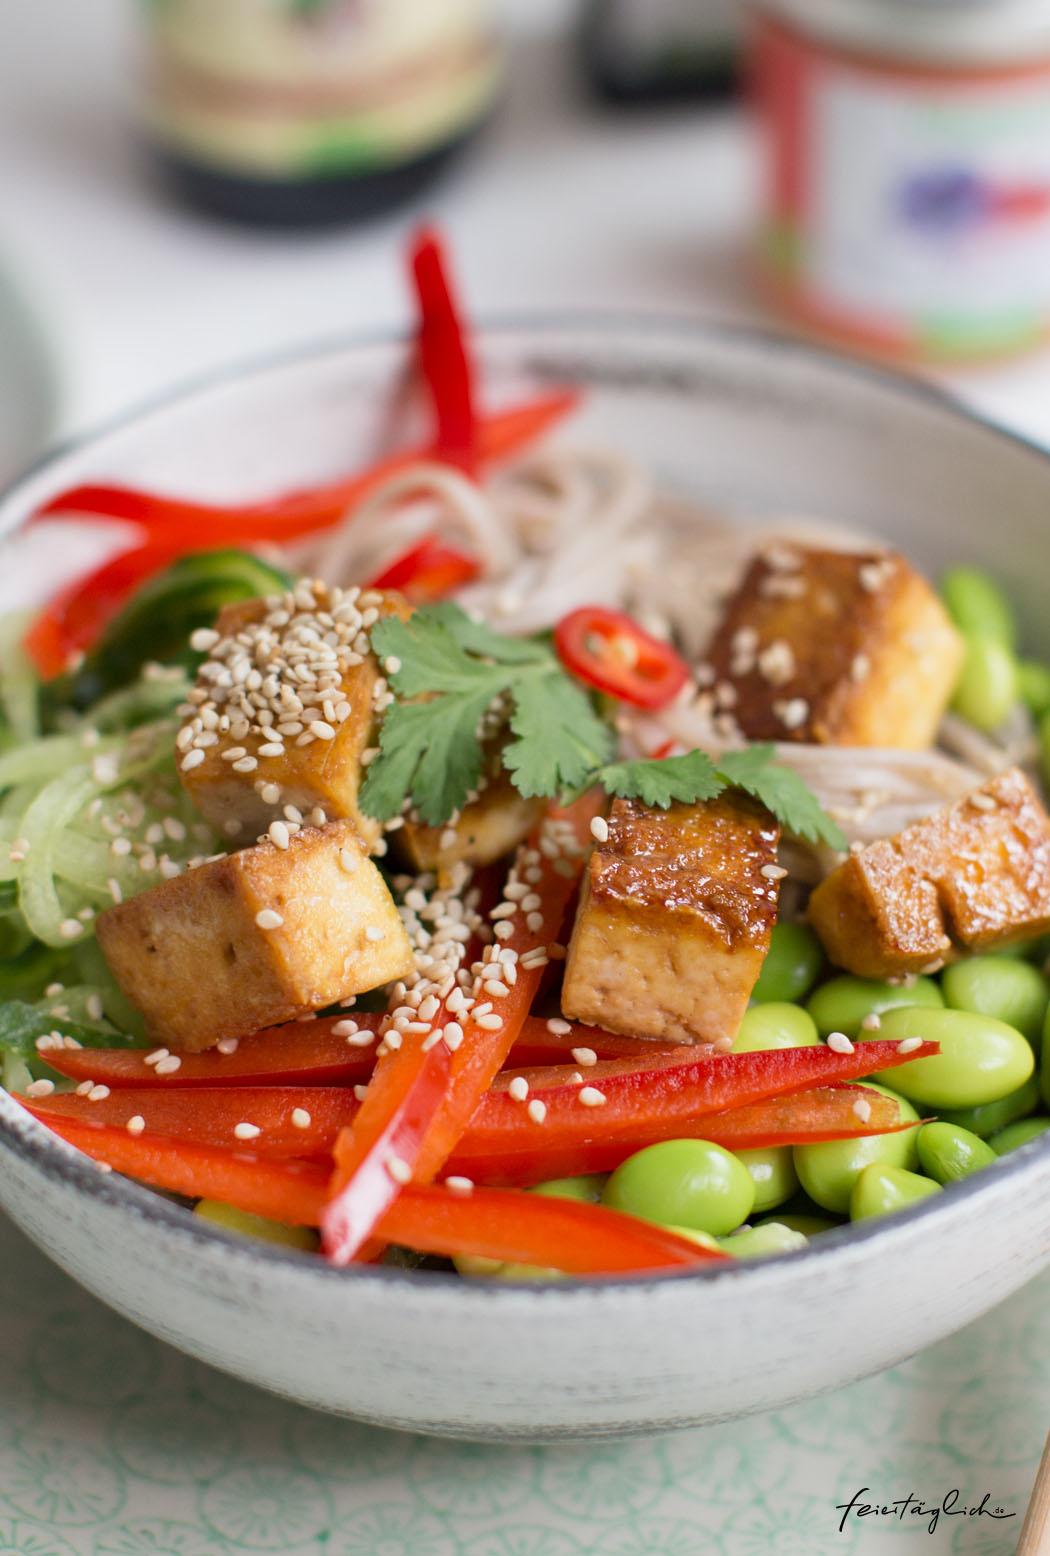 Rezept für vegane Sobanudel-Happy-Bowl mit Sesam-Tofu & Paprika-Chili Sauce, frischer Paprika, Gurke, Edamame & Koriander, #happybowl #bowl #buddhabowl #veganfood #vegan